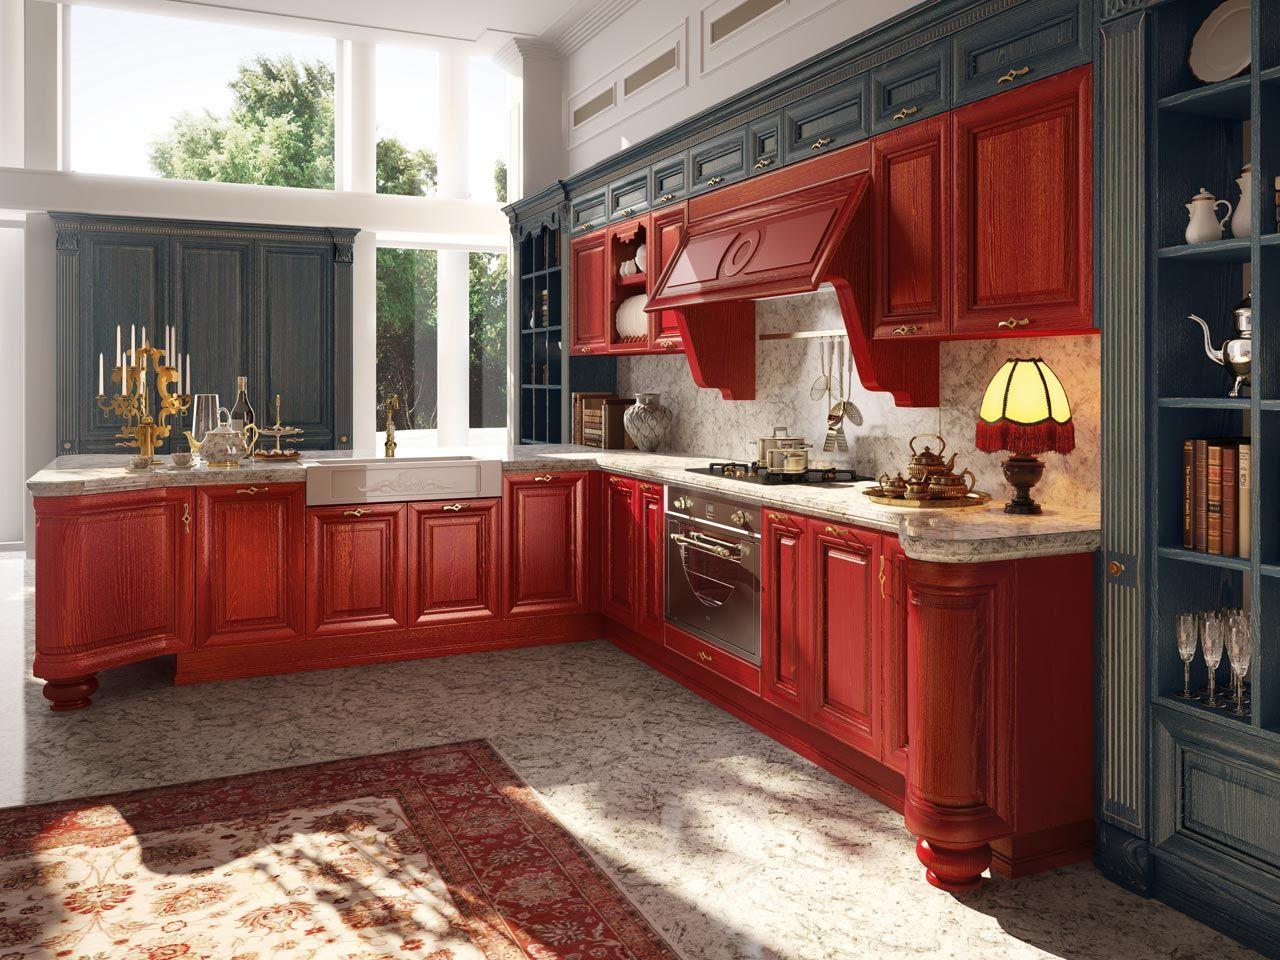 Cucina decapata con maniglie collezione pantheon by cucine for Maniglie cucina lube